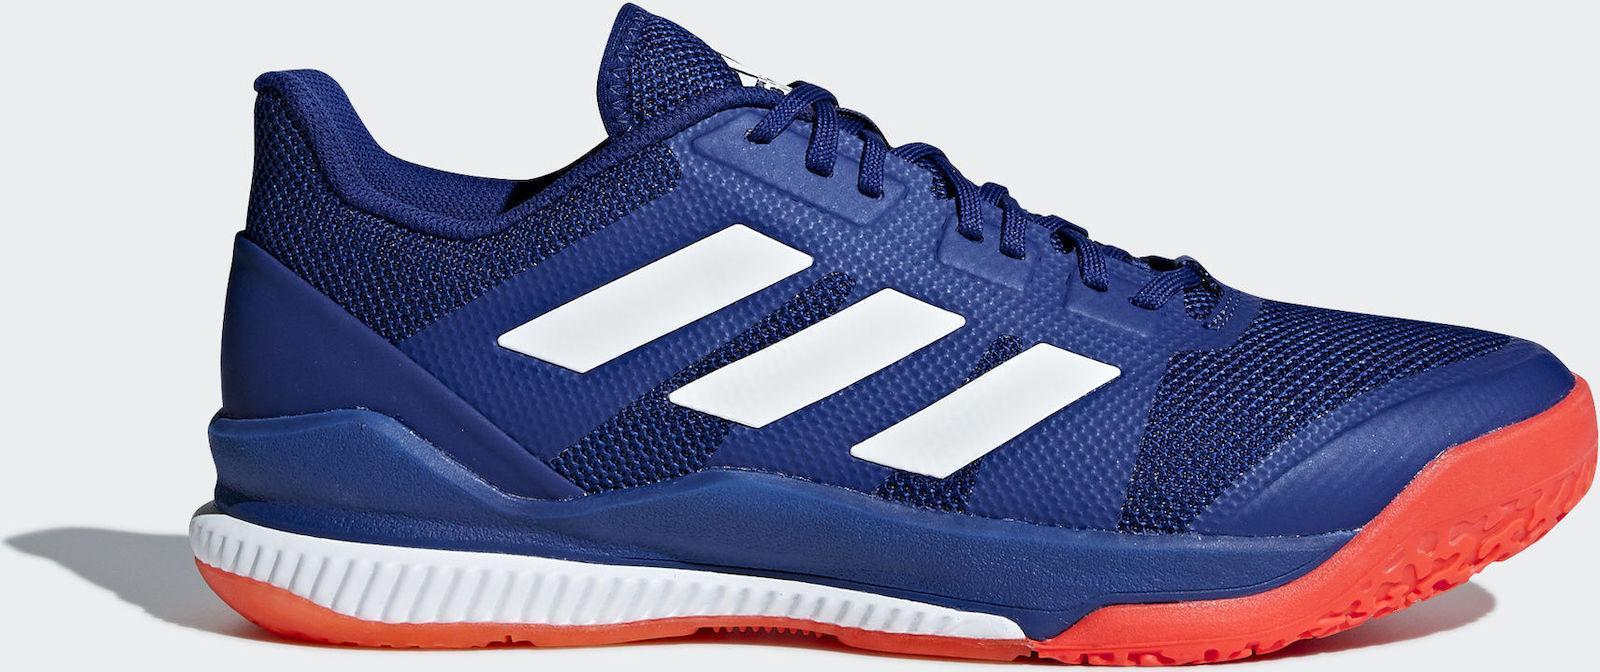 b0b07504a Adidas Stabil Bounce Squash Shoes - Blue - Just Squash